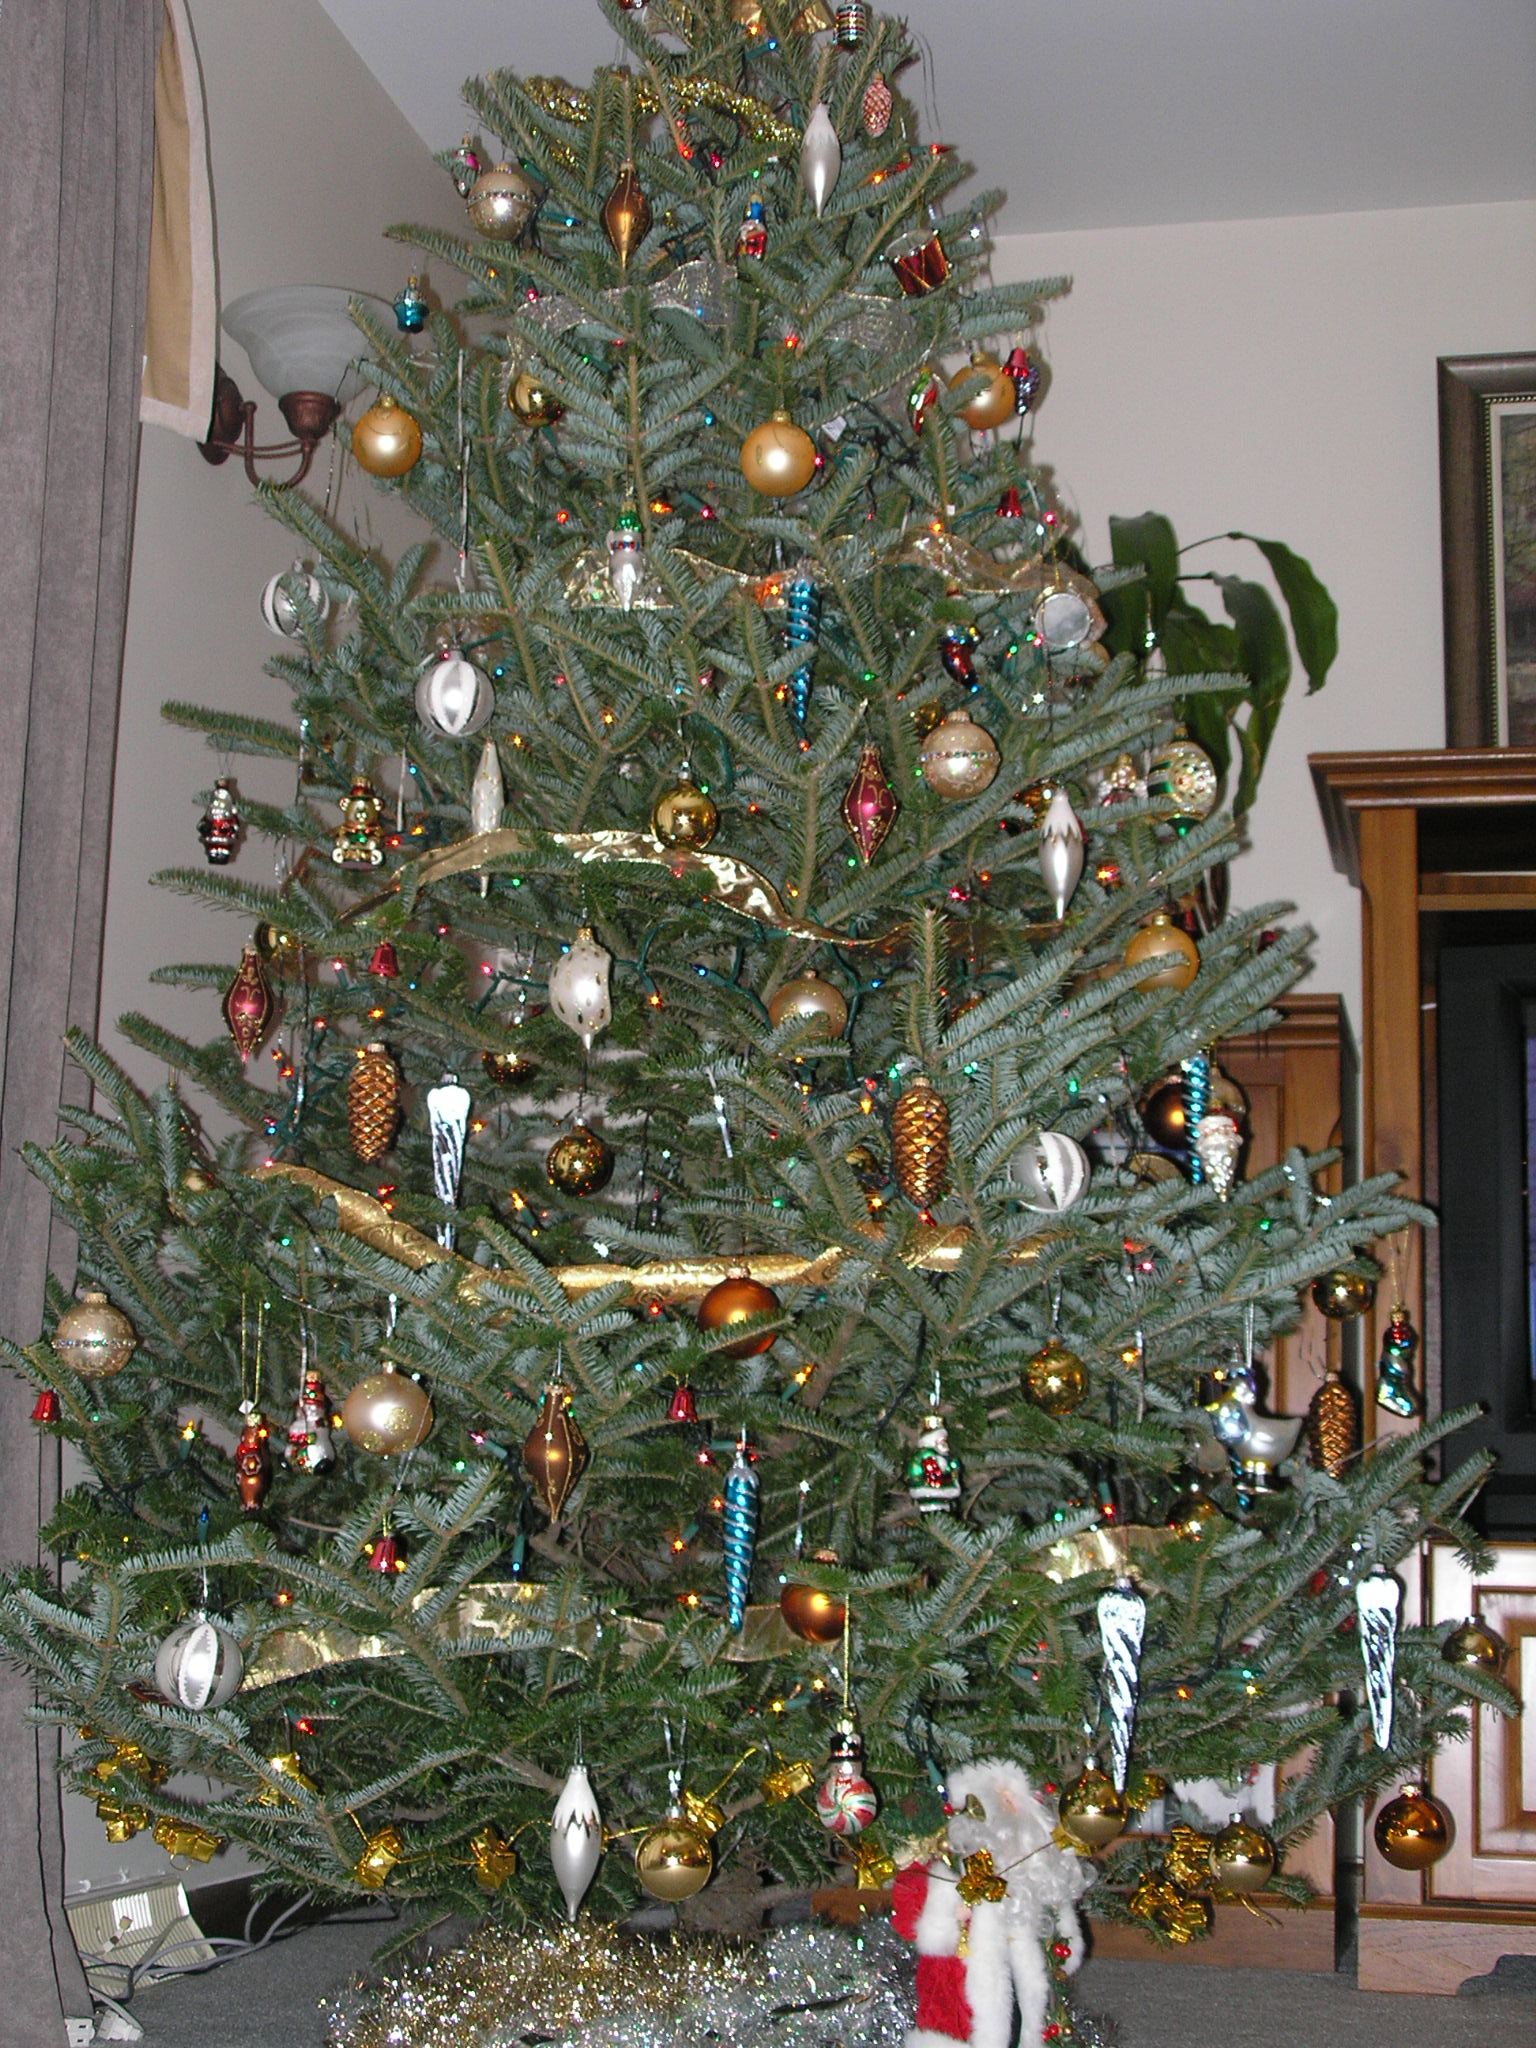 File:Christmas tree (ddima).JPG - Wikimedia Commons